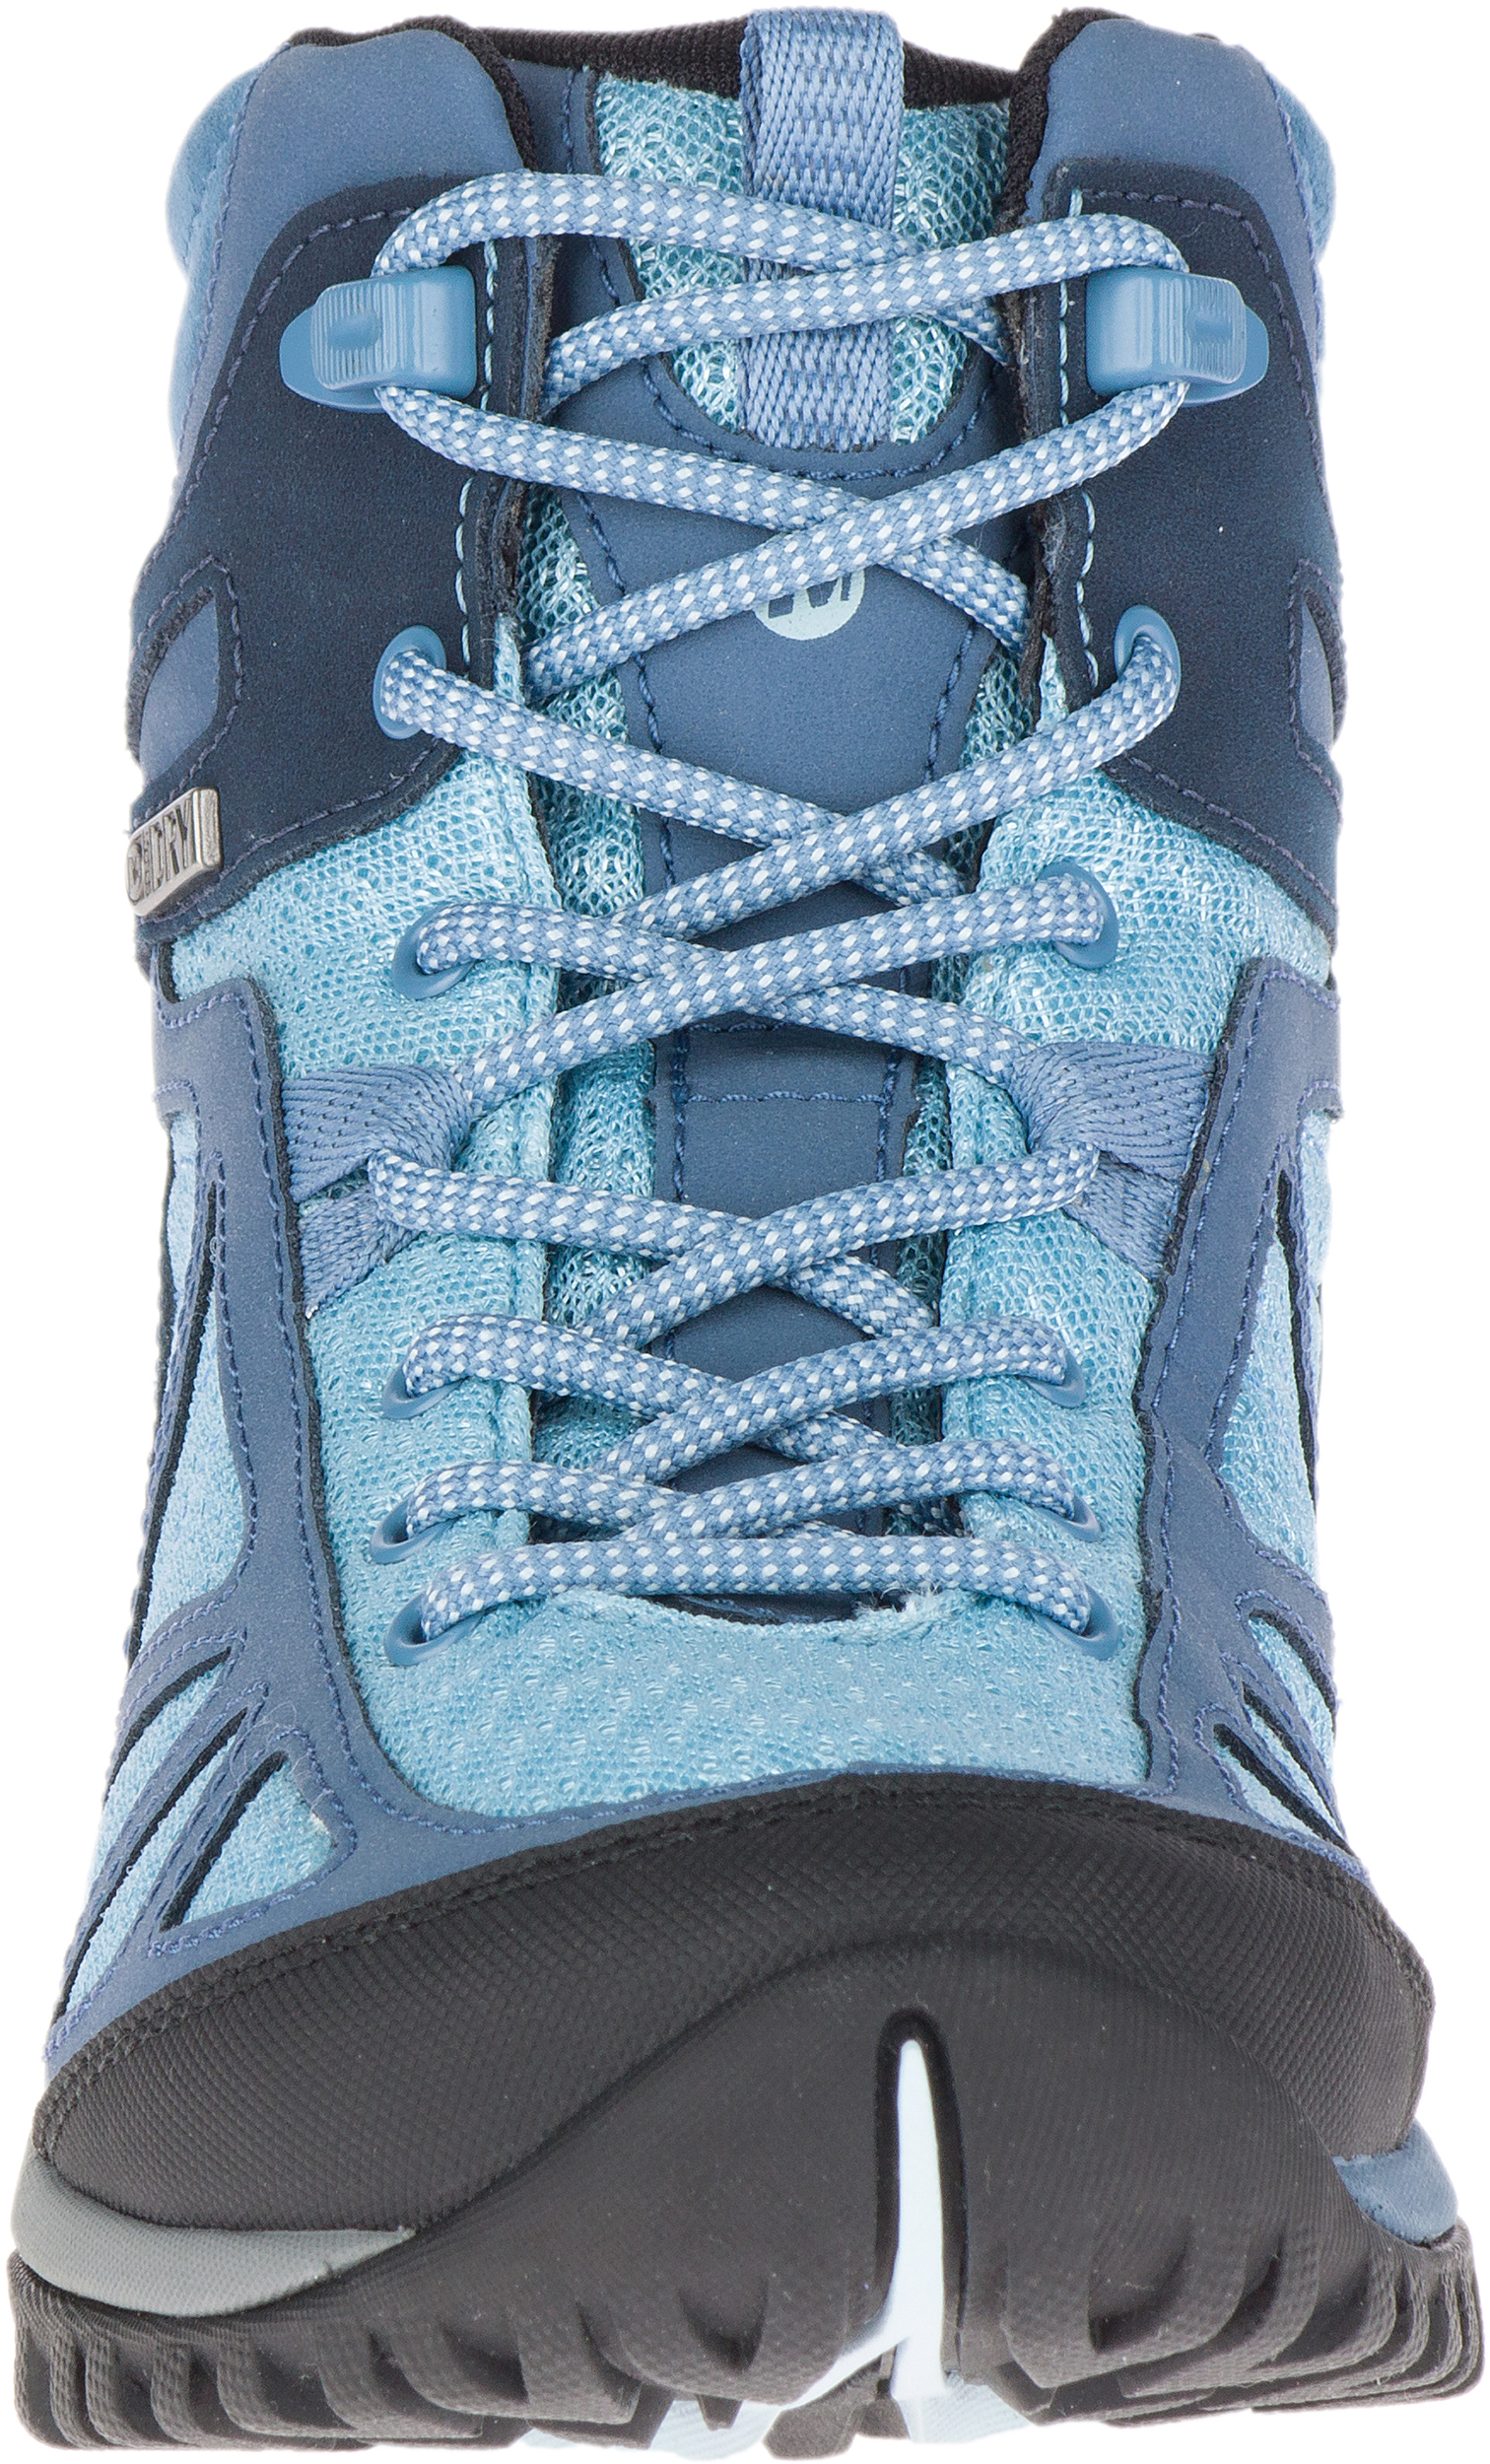 edab66d7269 Merrell Siren Sport Q2 Mid Waterproof Shoes - Women's